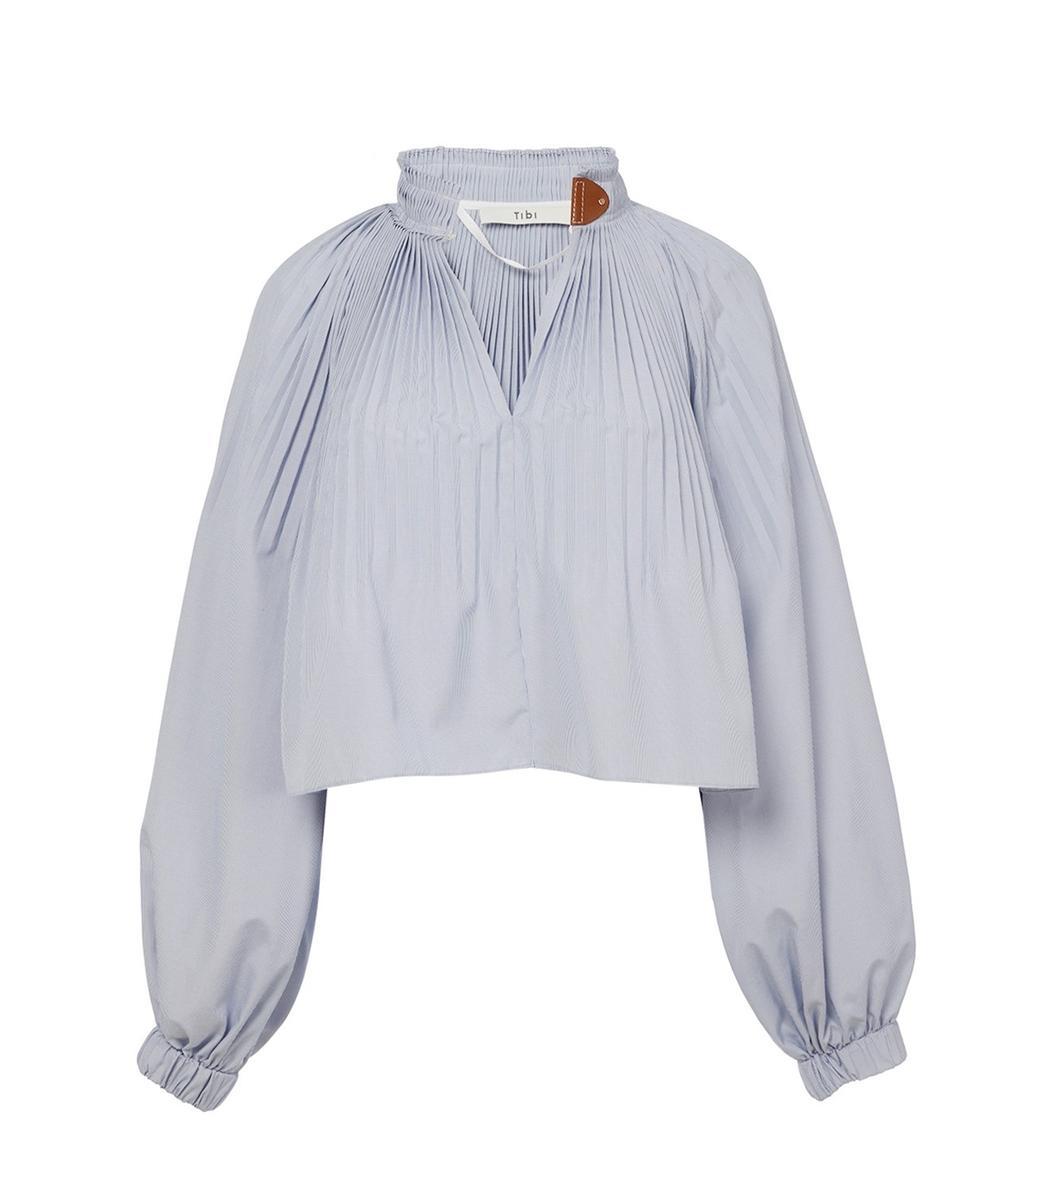 Tibi Blue/White Multi Isabelle Shirting Top In Blue/White Multicolor